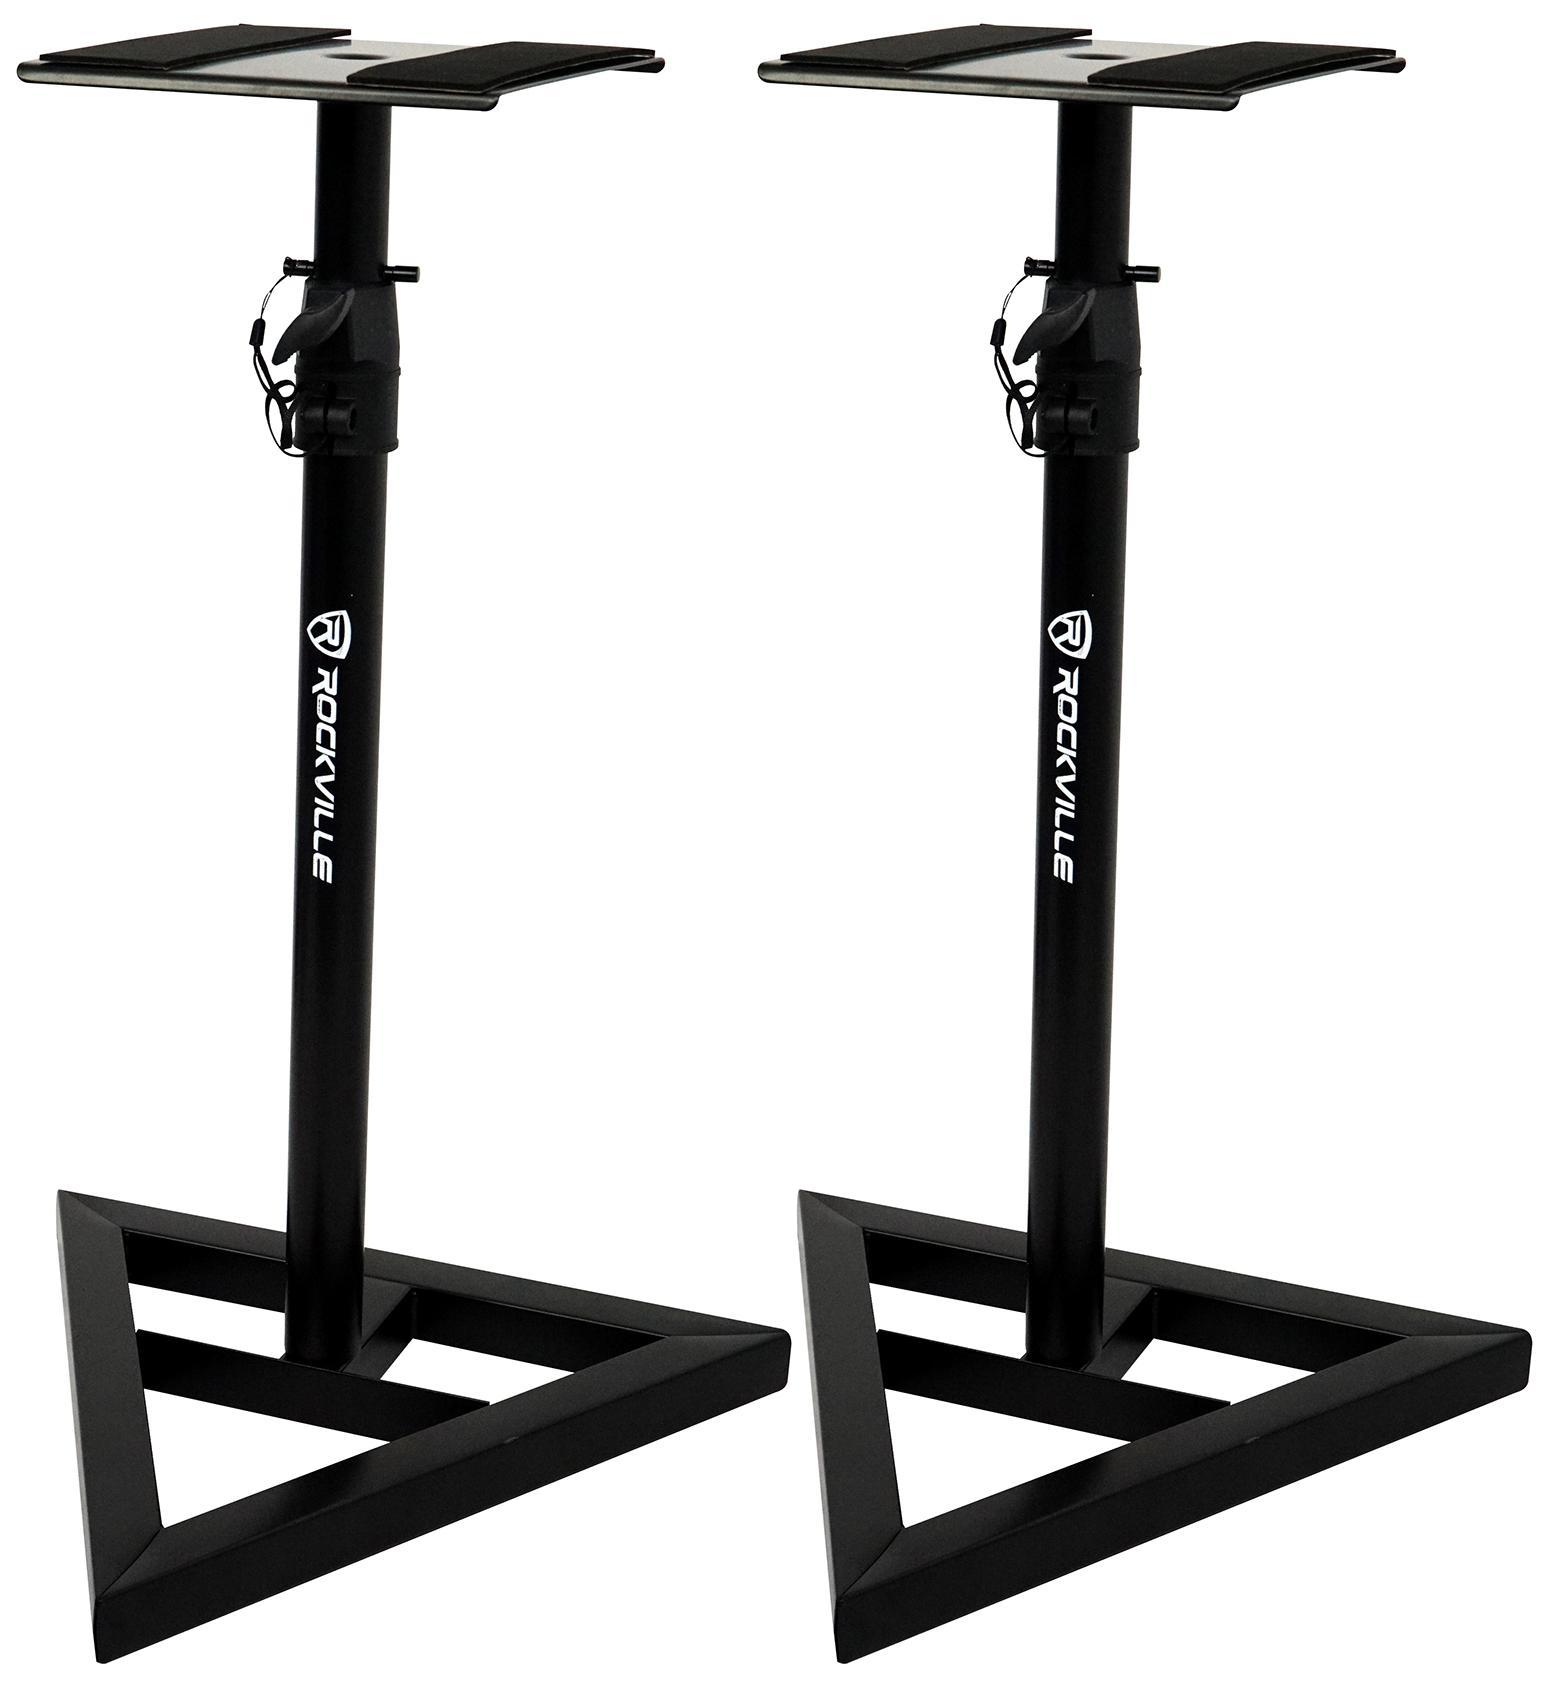 rockville rvsm1 pair of near field studio monitor stands w adjustable height. Black Bedroom Furniture Sets. Home Design Ideas